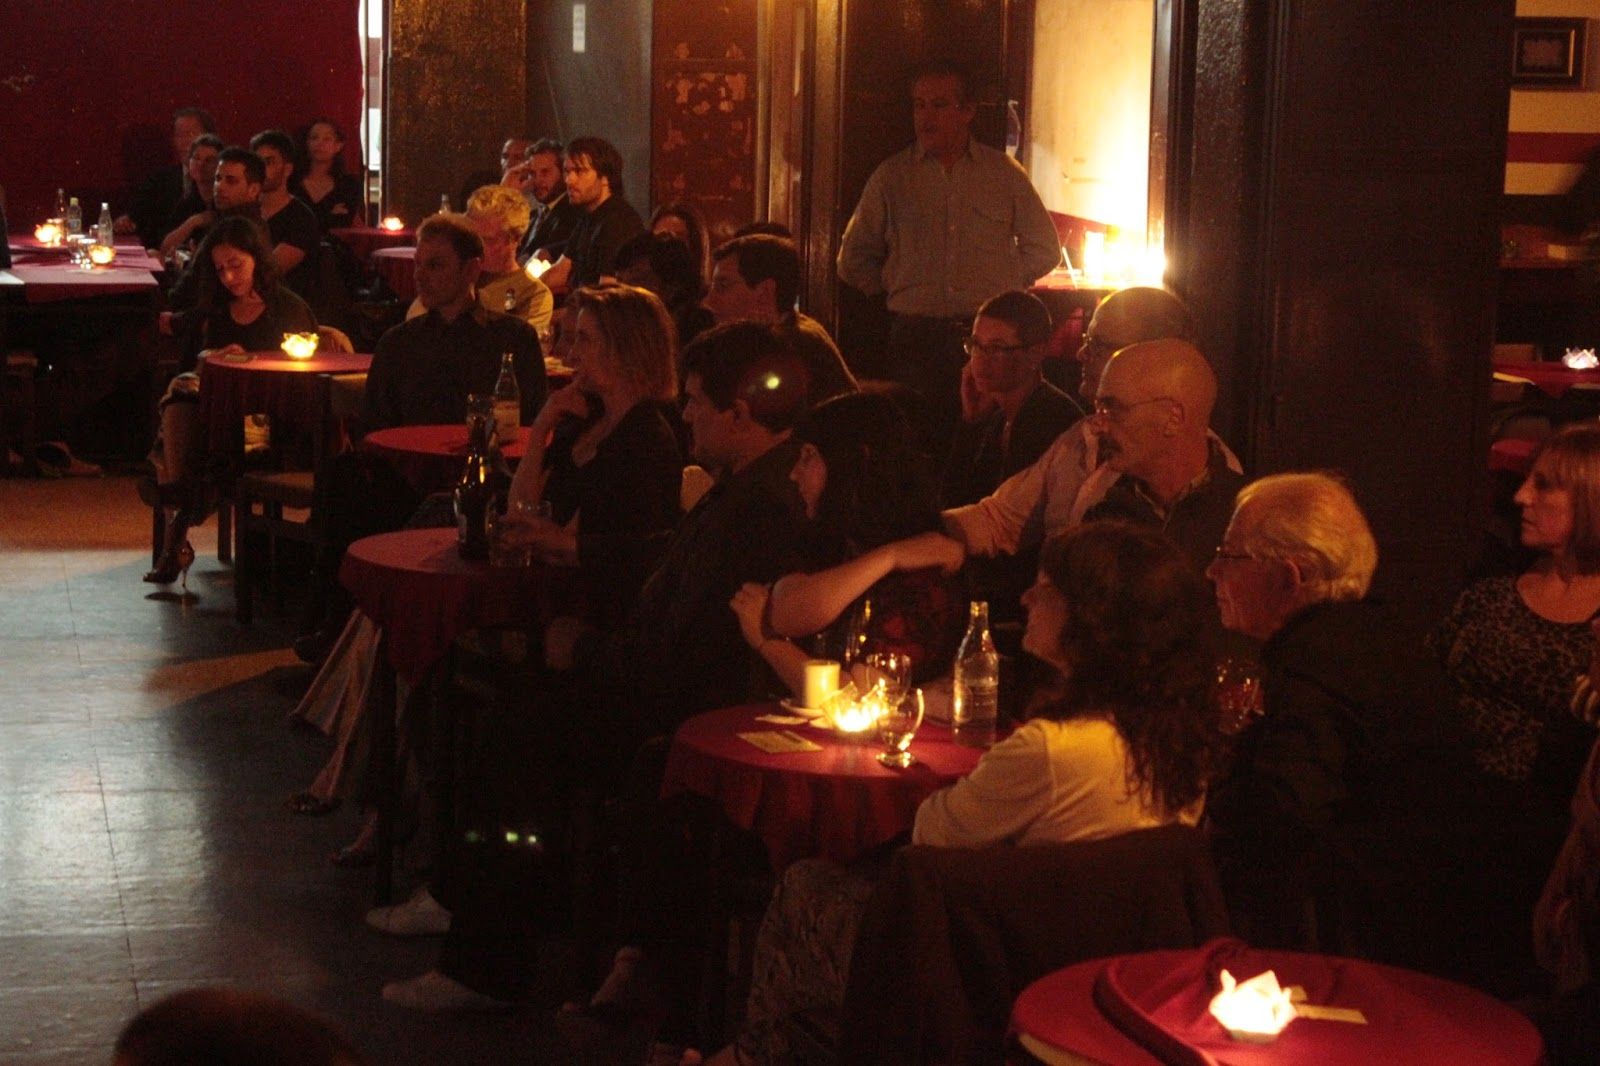 Soho tango clase milonga orquesta en vivo for A puro tango salon canning